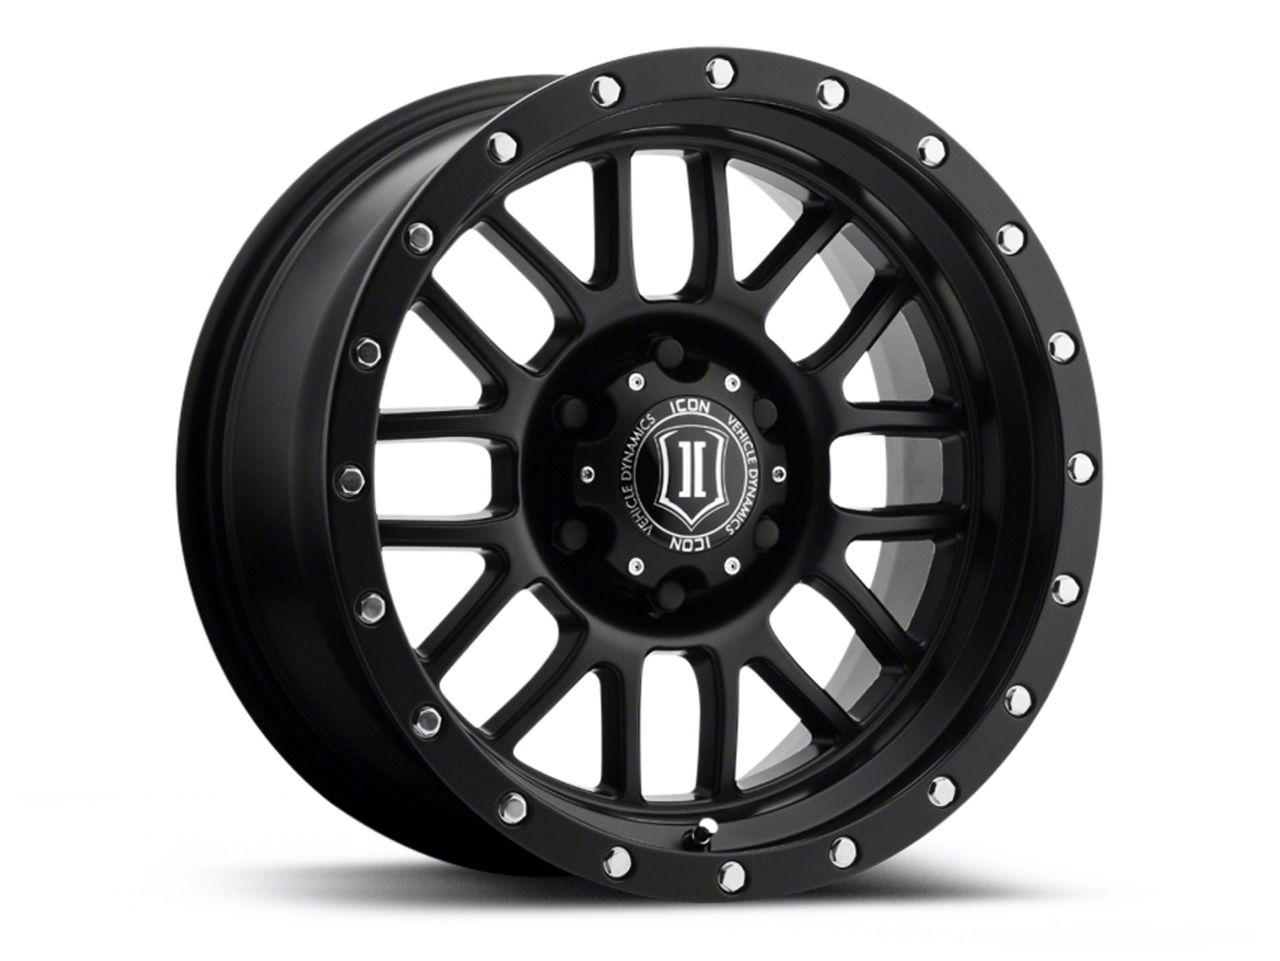 ICON Vehicle Dynamics Alpha Satin Black Wheel - 17x8.5 (07-18 Jeep Wrangler JK; 2018 Jeep Wrangler JL)